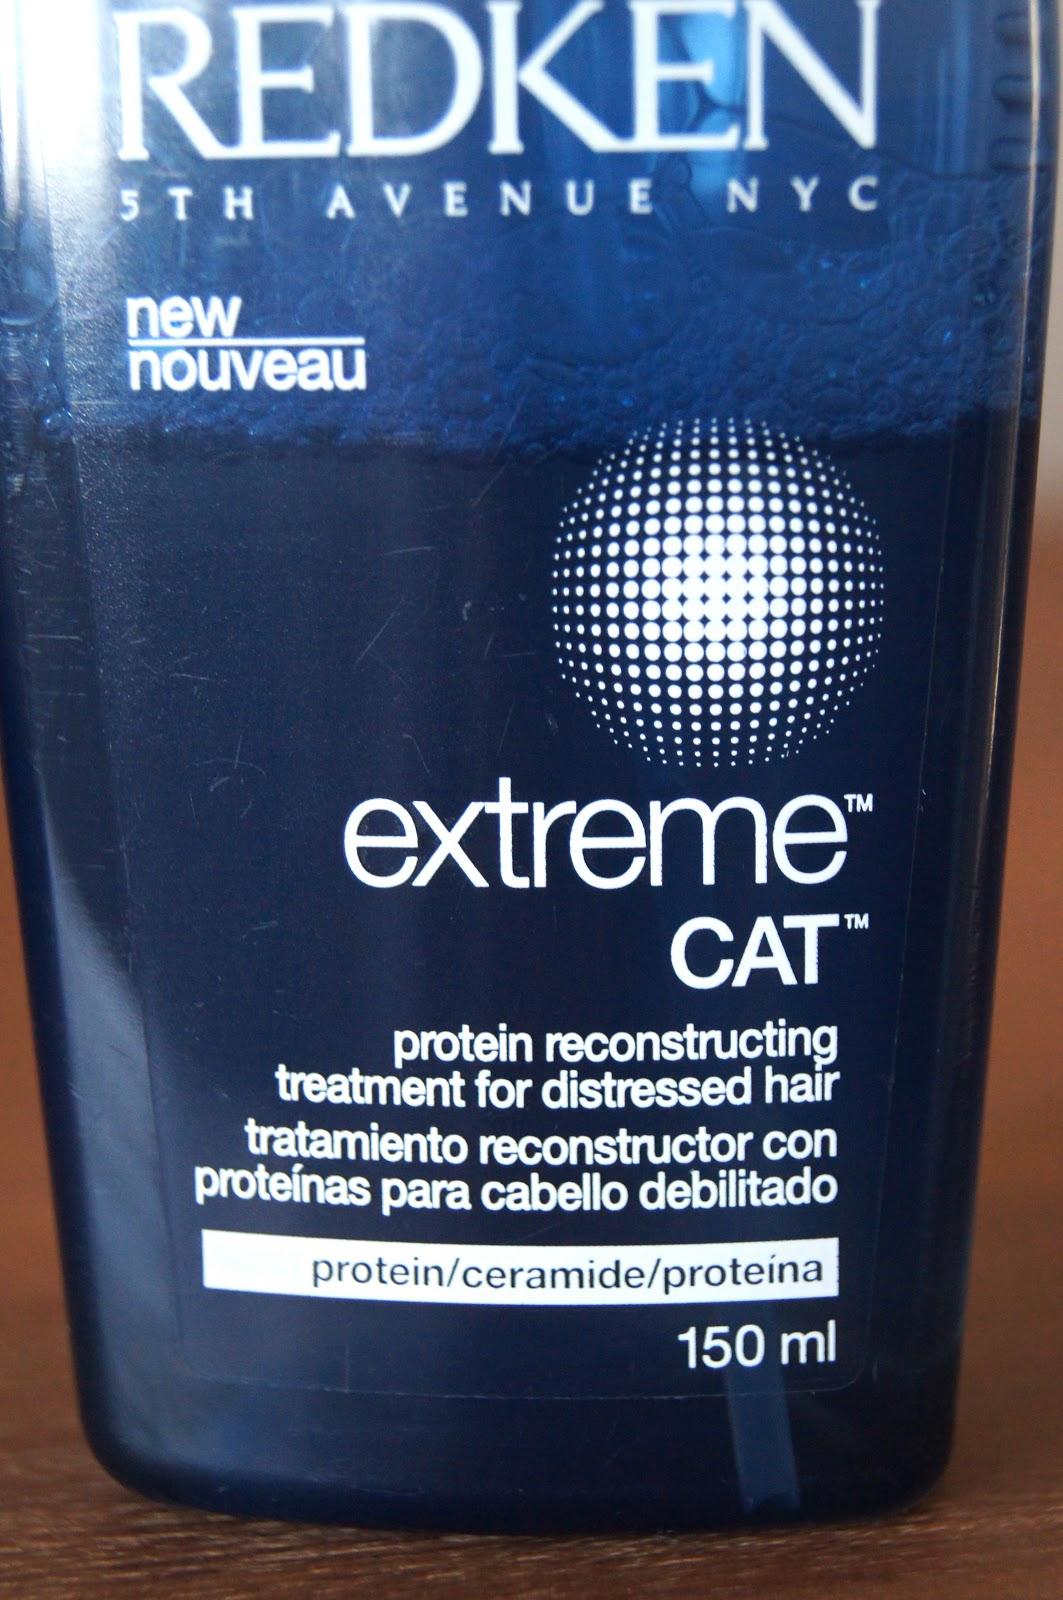 redken extreme cat protein treatment